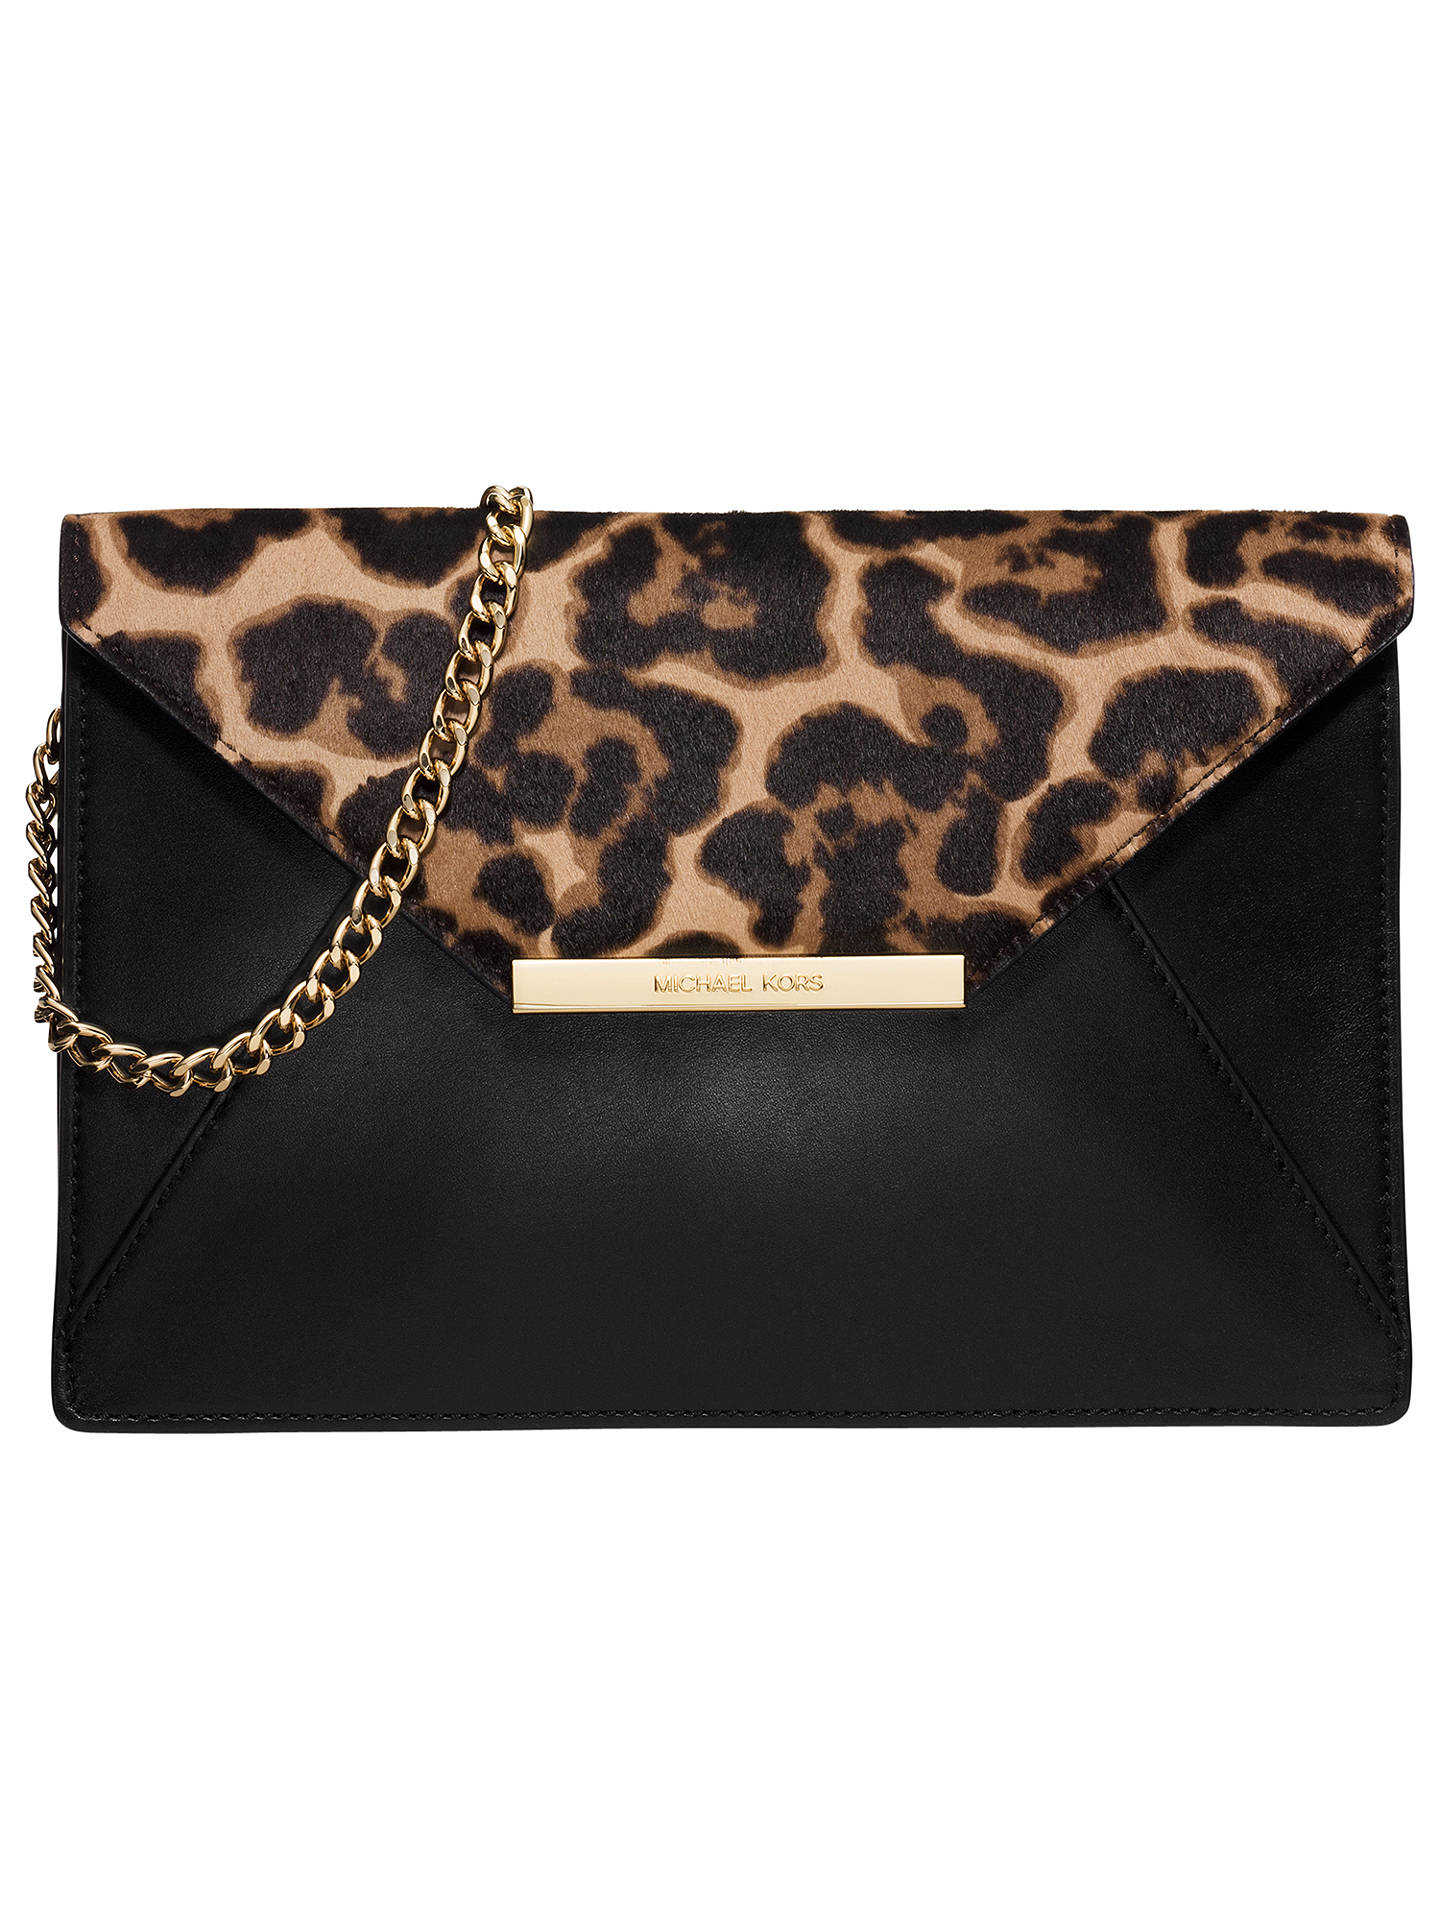 5987deb231d85c BuyMICHAEL Michael Kors Lana Envelope Clutch, Multi Online at johnlewis.com  ...